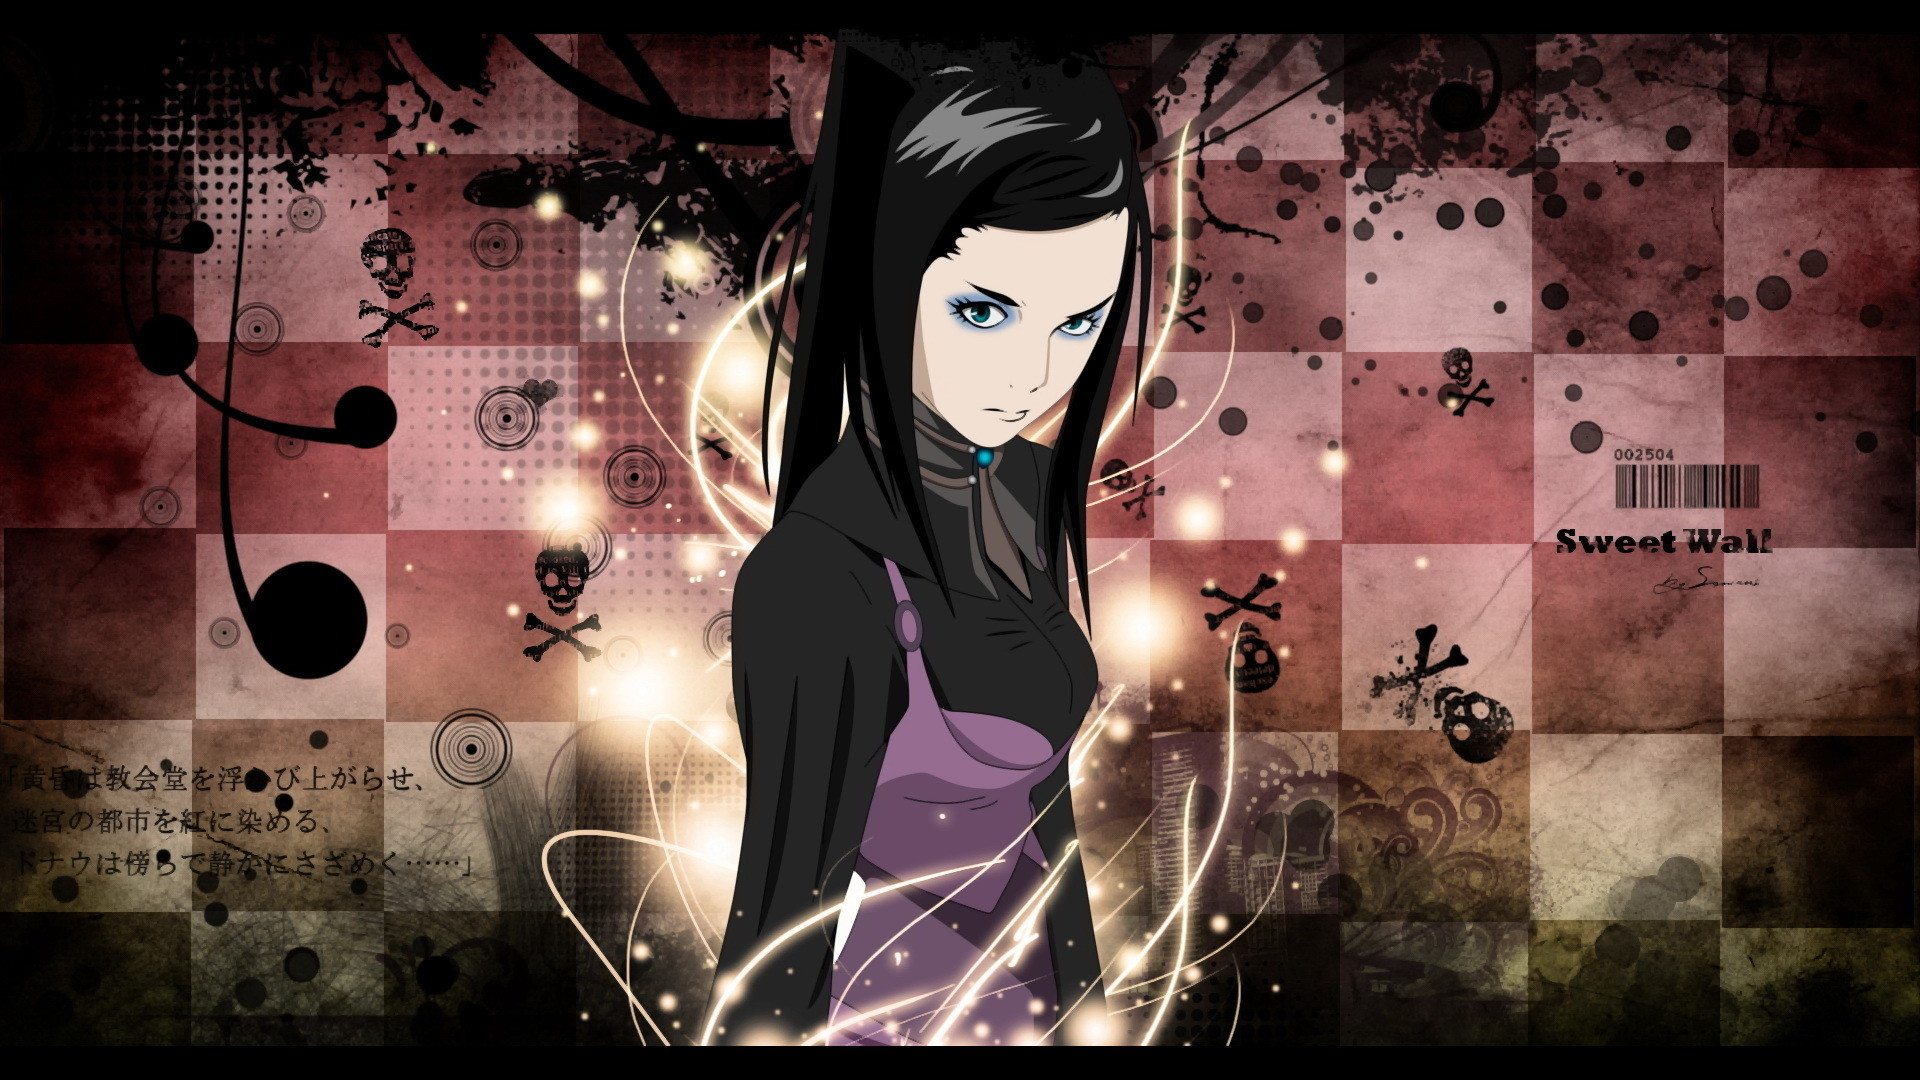 Res: 1920x1080, Anime - Ergo Proxy Wallpaper